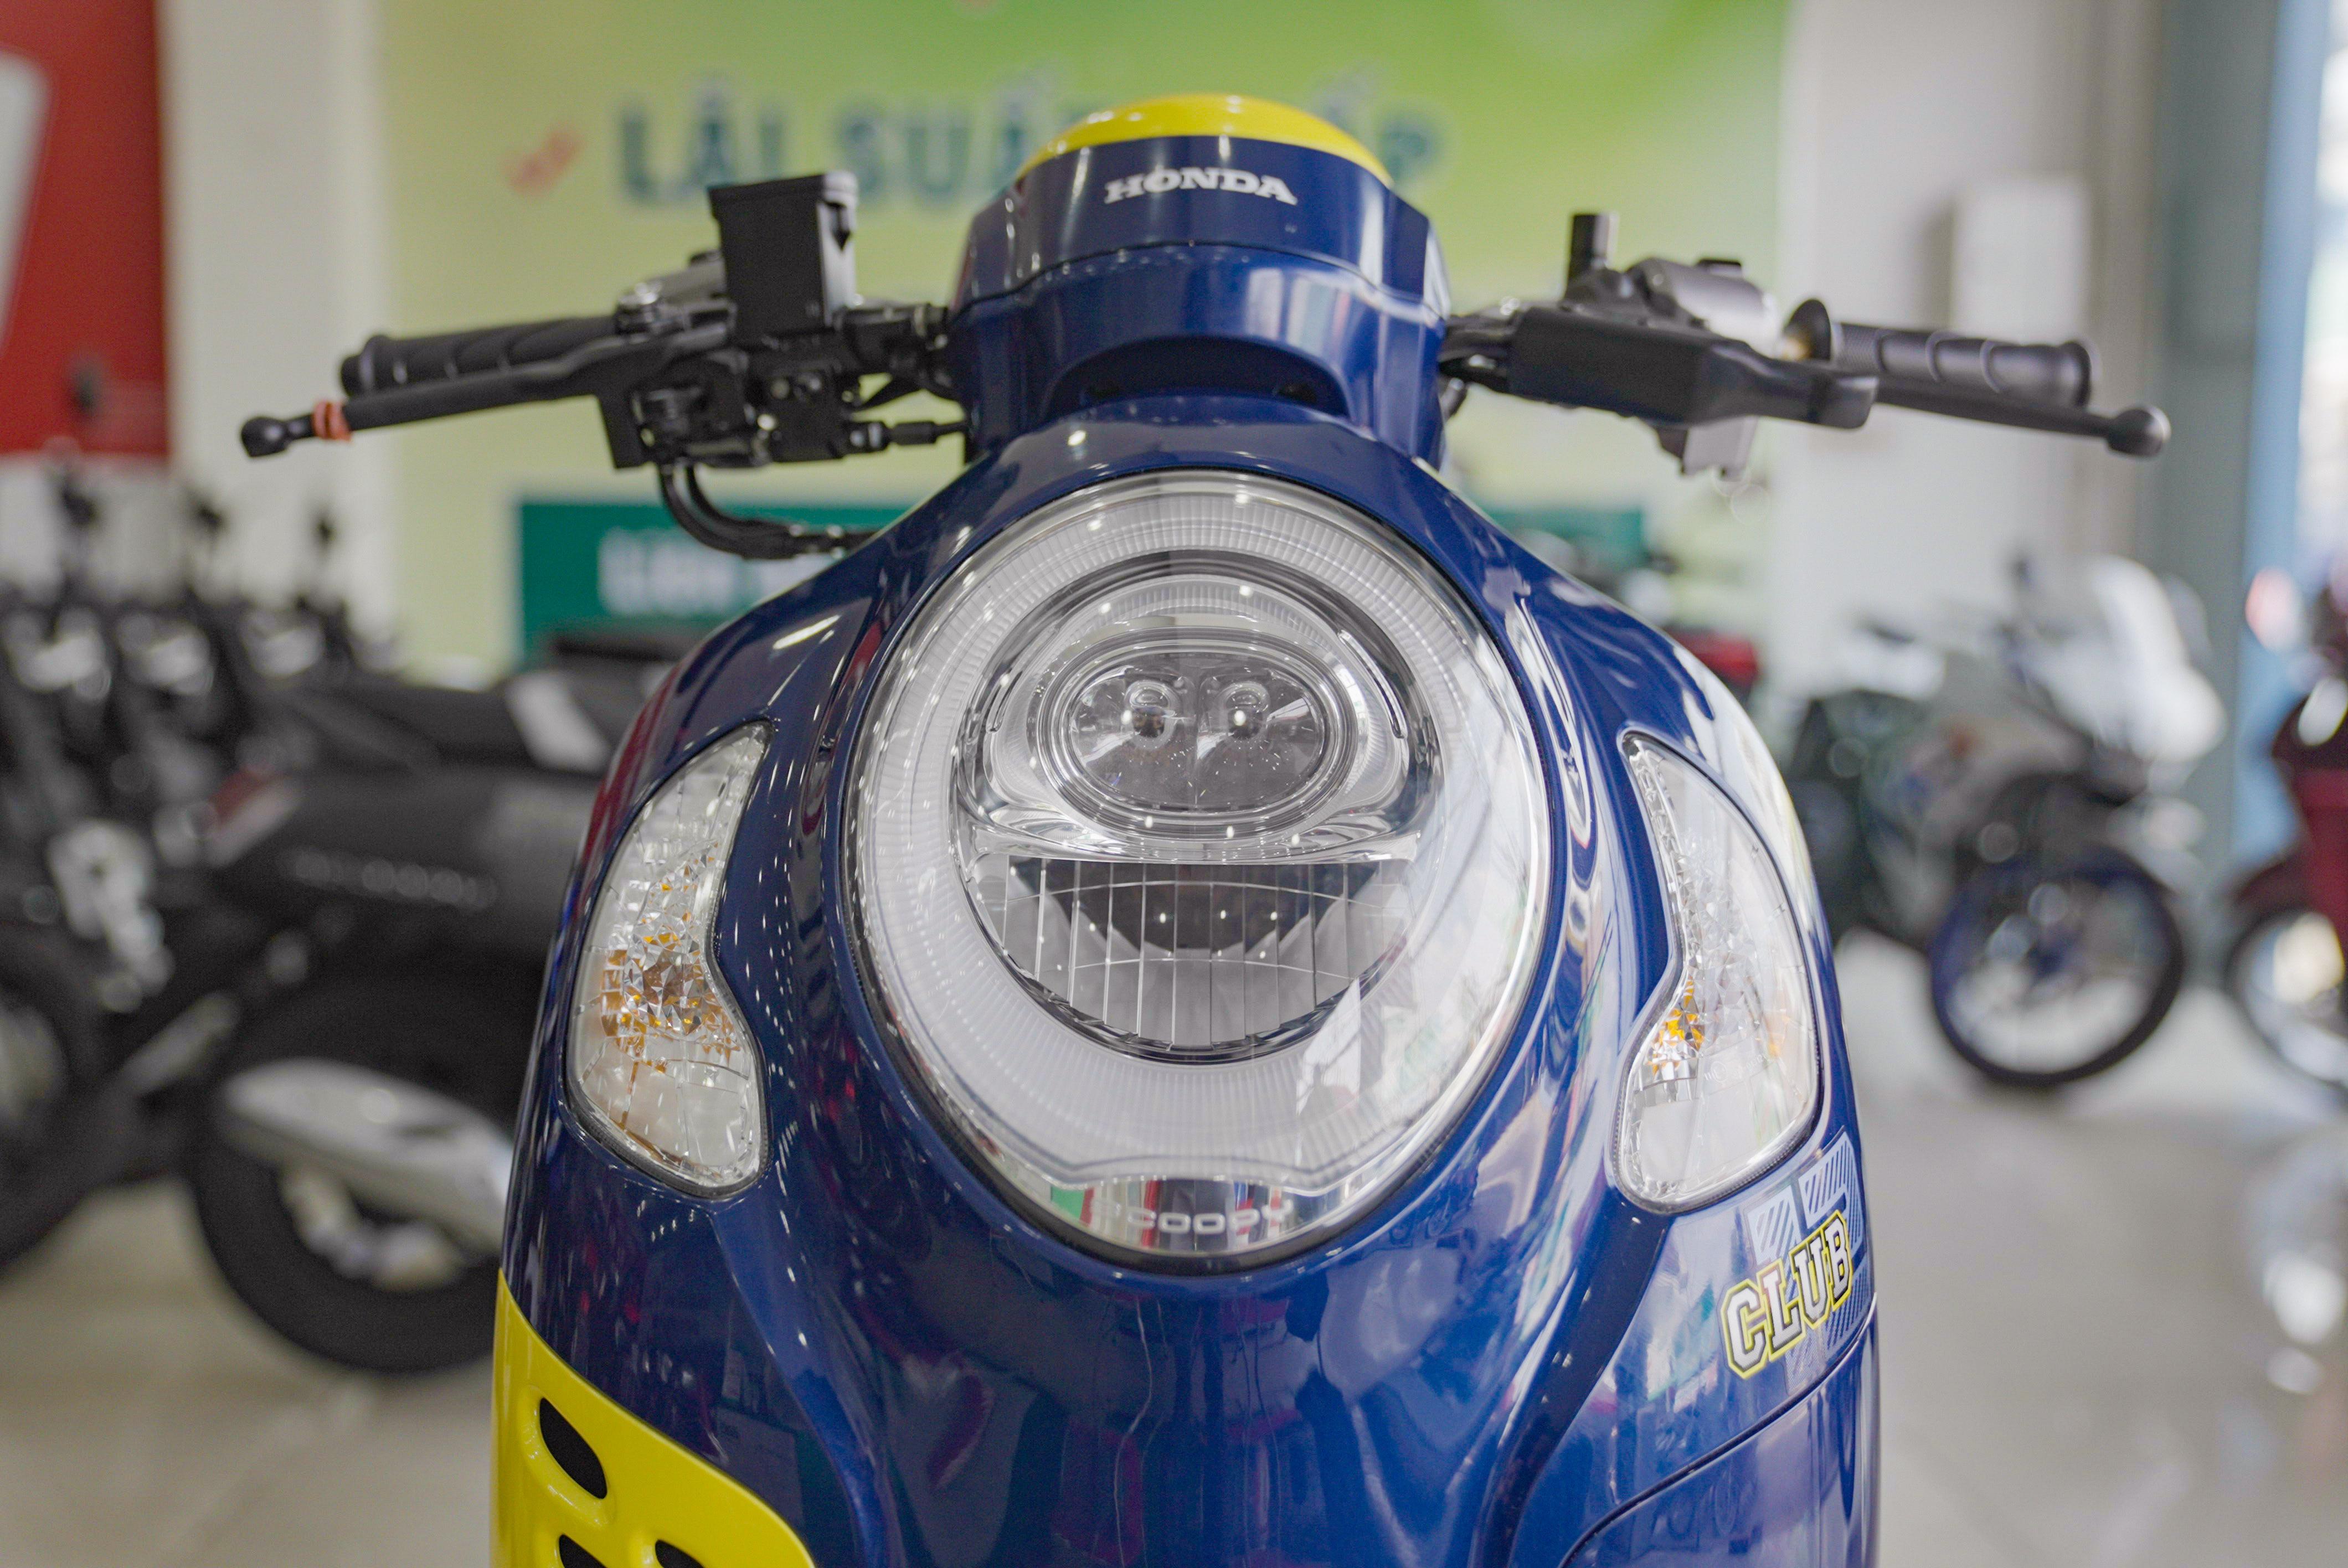 So sanh Honda Scoopy 2021 va Yamaha Janus anh 5